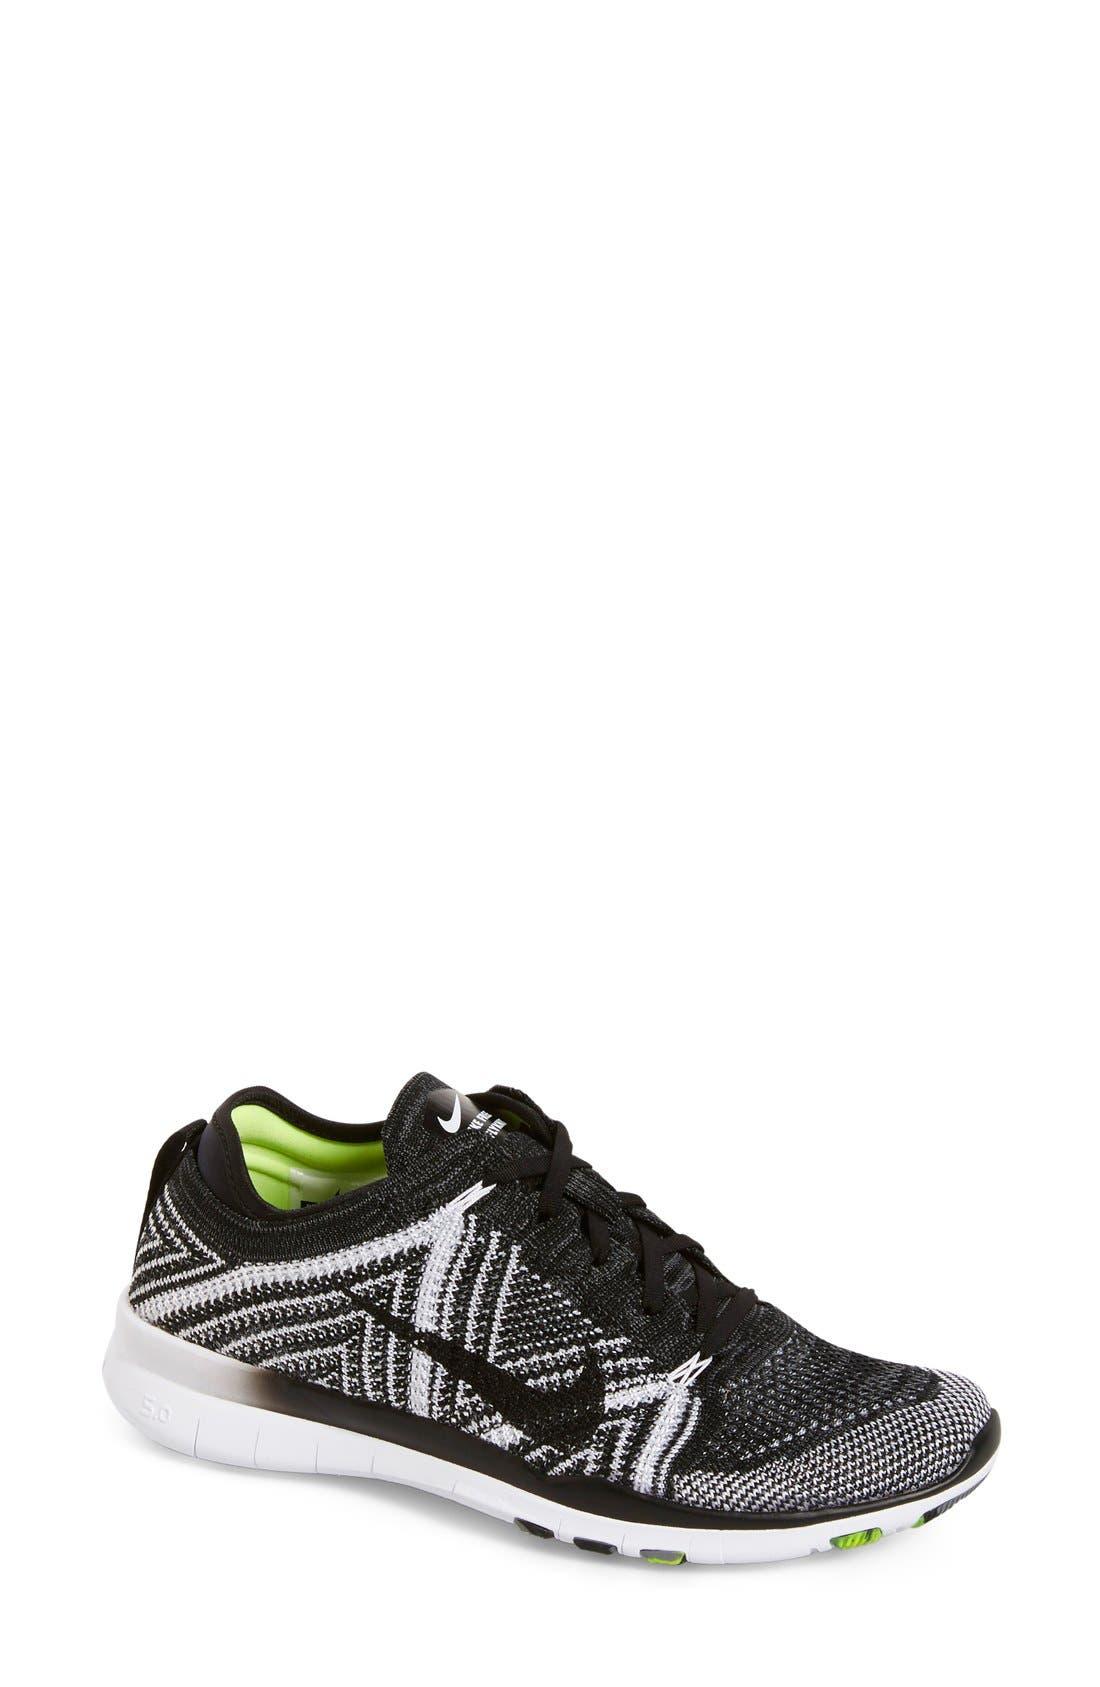 Main Image - Nike 'Free Flyknit 5.0 TR' Training Shoe (Women)